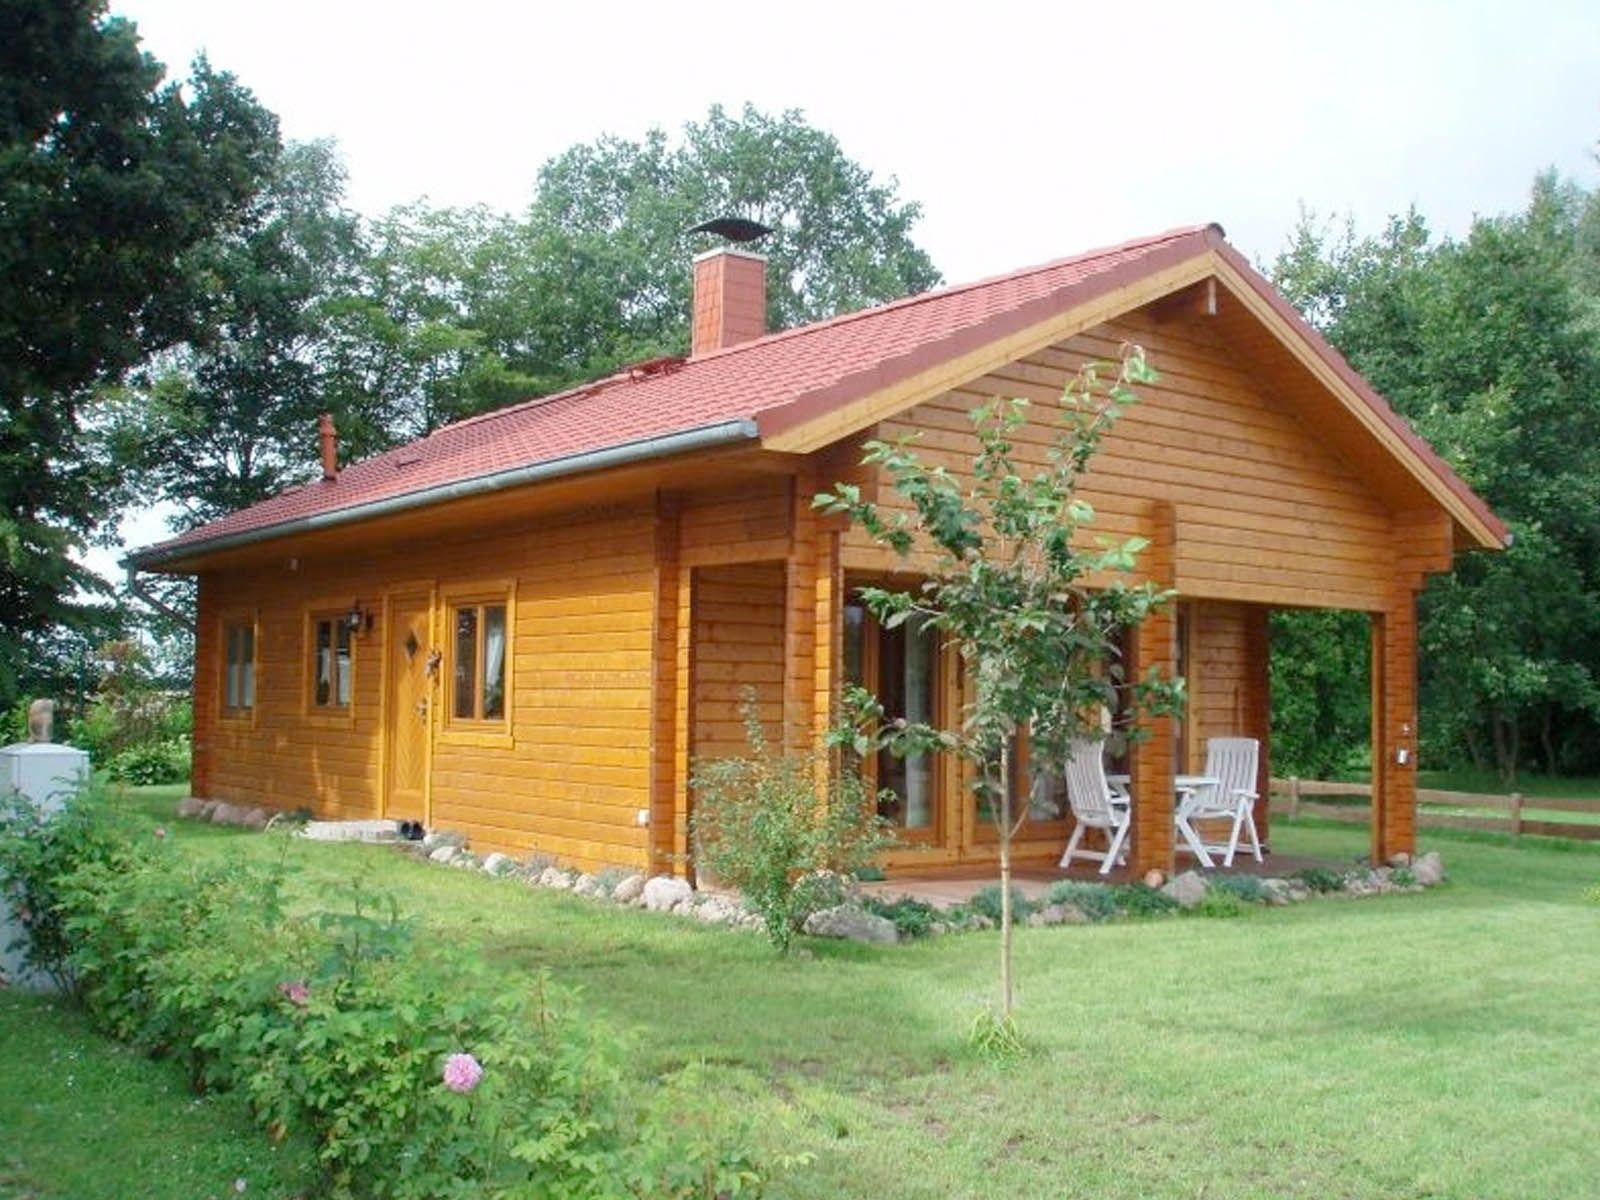 blockhaus sb70 62 kohaus pinterest haus haus bauen und bungalow. Black Bedroom Furniture Sets. Home Design Ideas